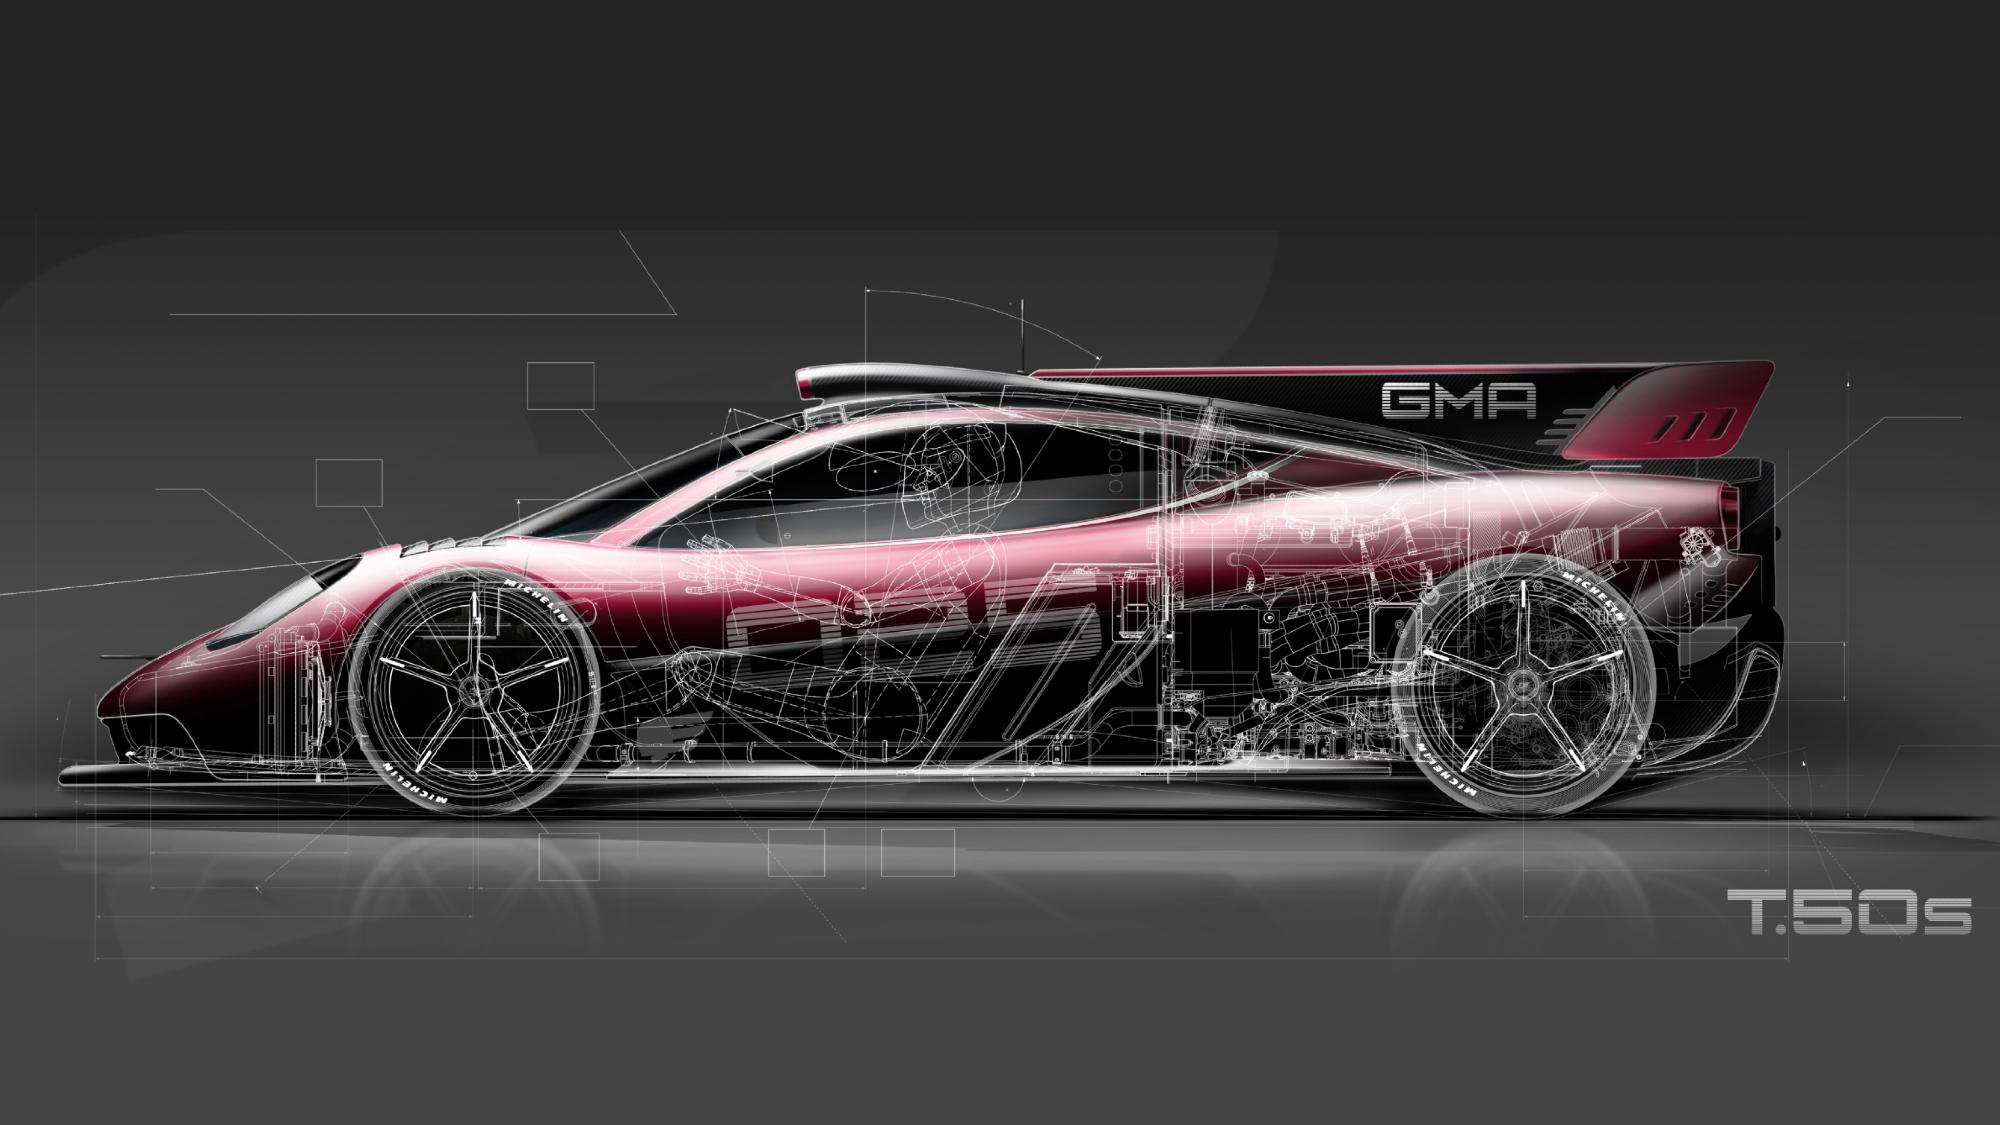 Gordon Murray unveils T50s racing version of supercar